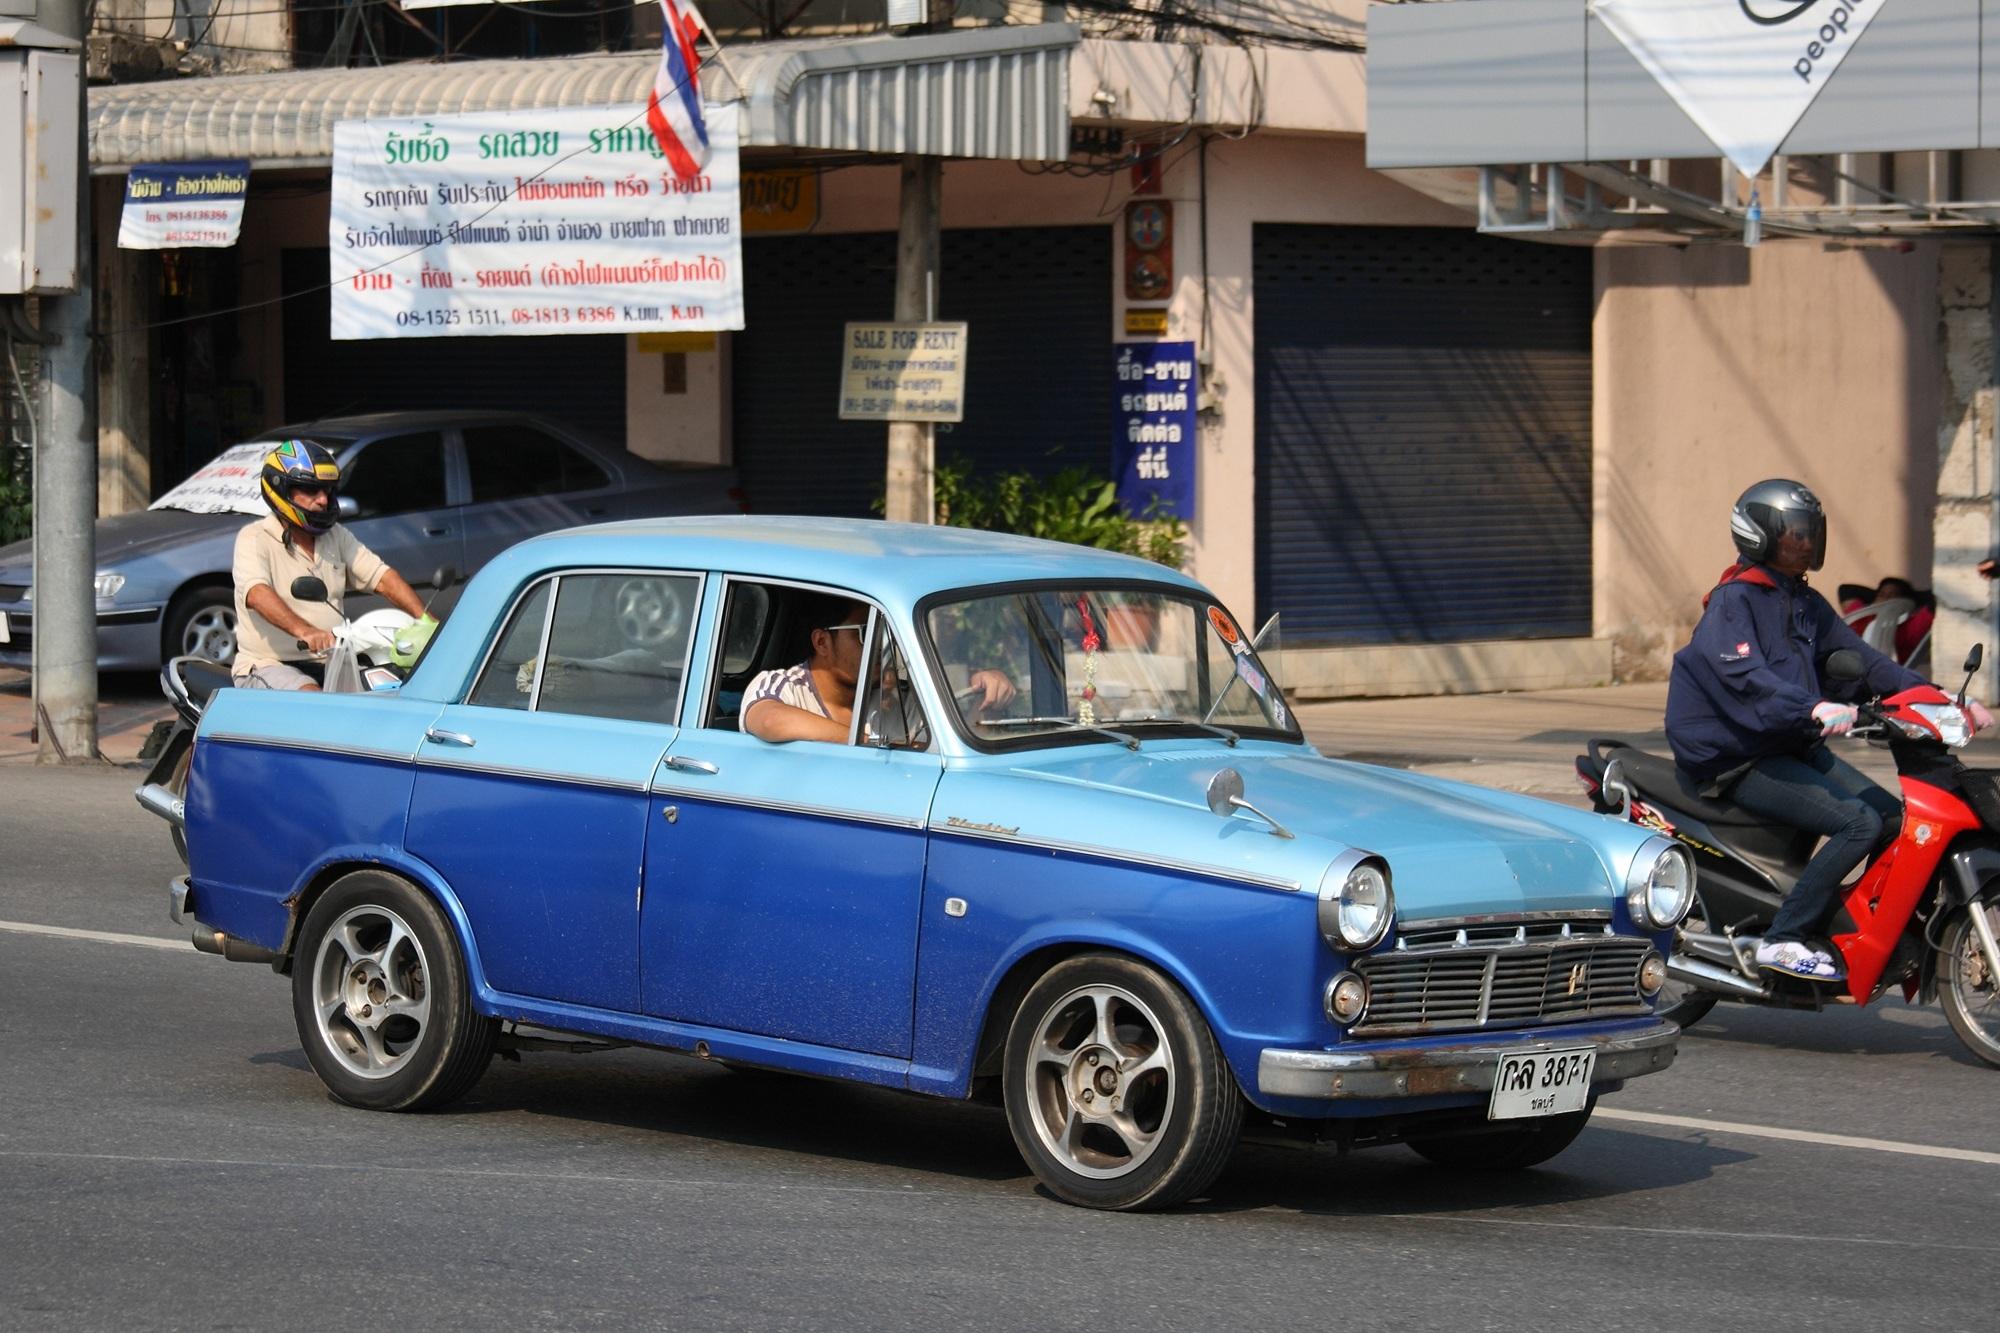 File:Datsun Bluebird in Pattaya.JPG - Wikimedia Commons